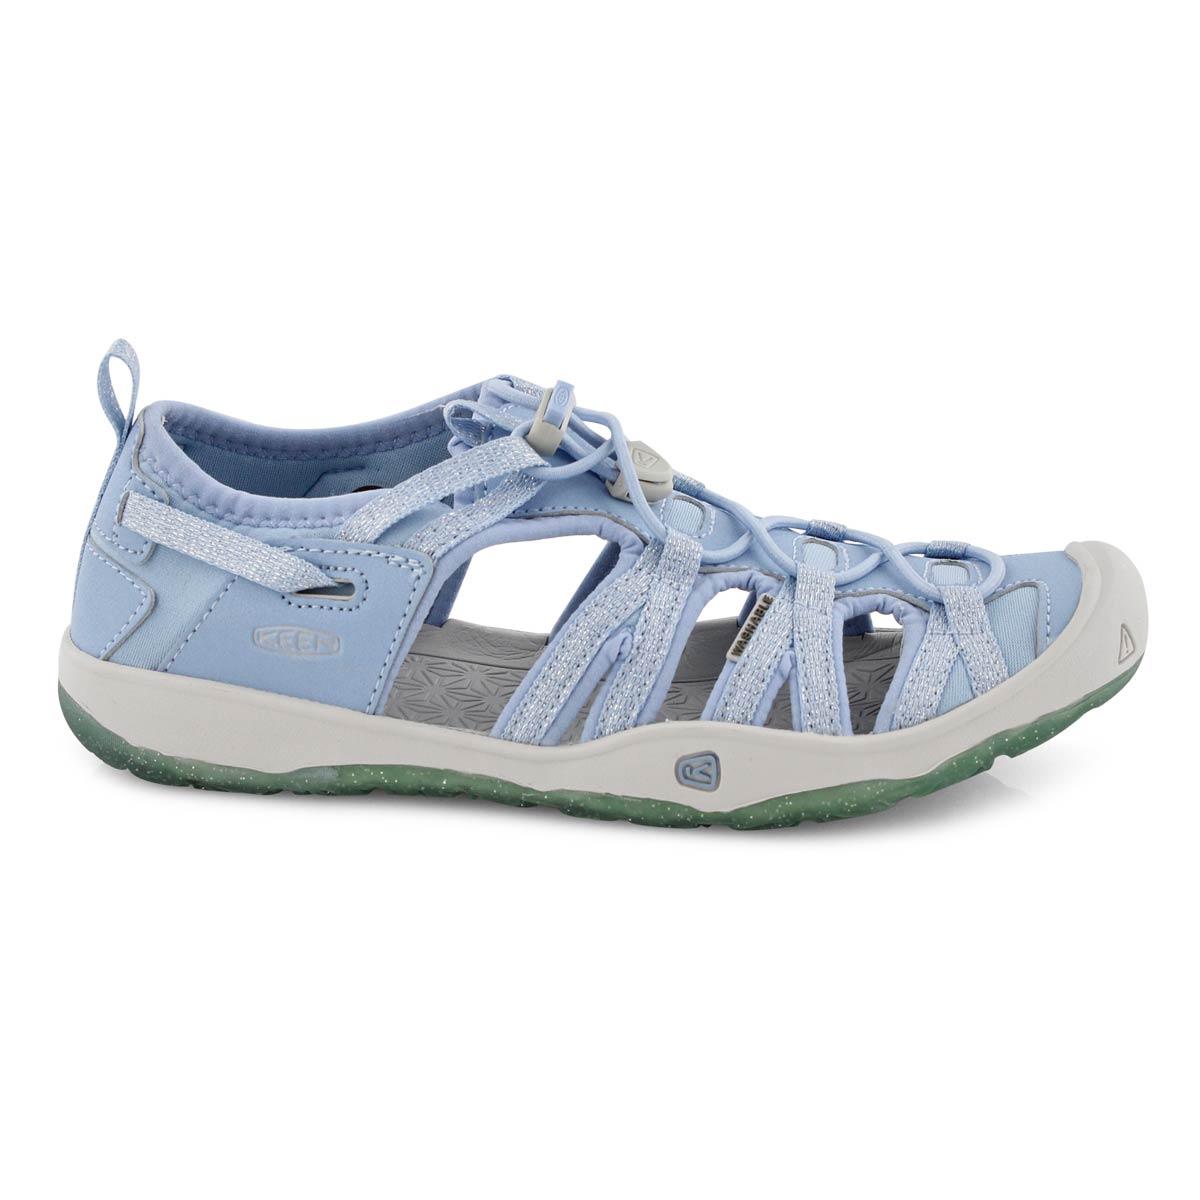 Grls Moxie pwdr blu sport sandal